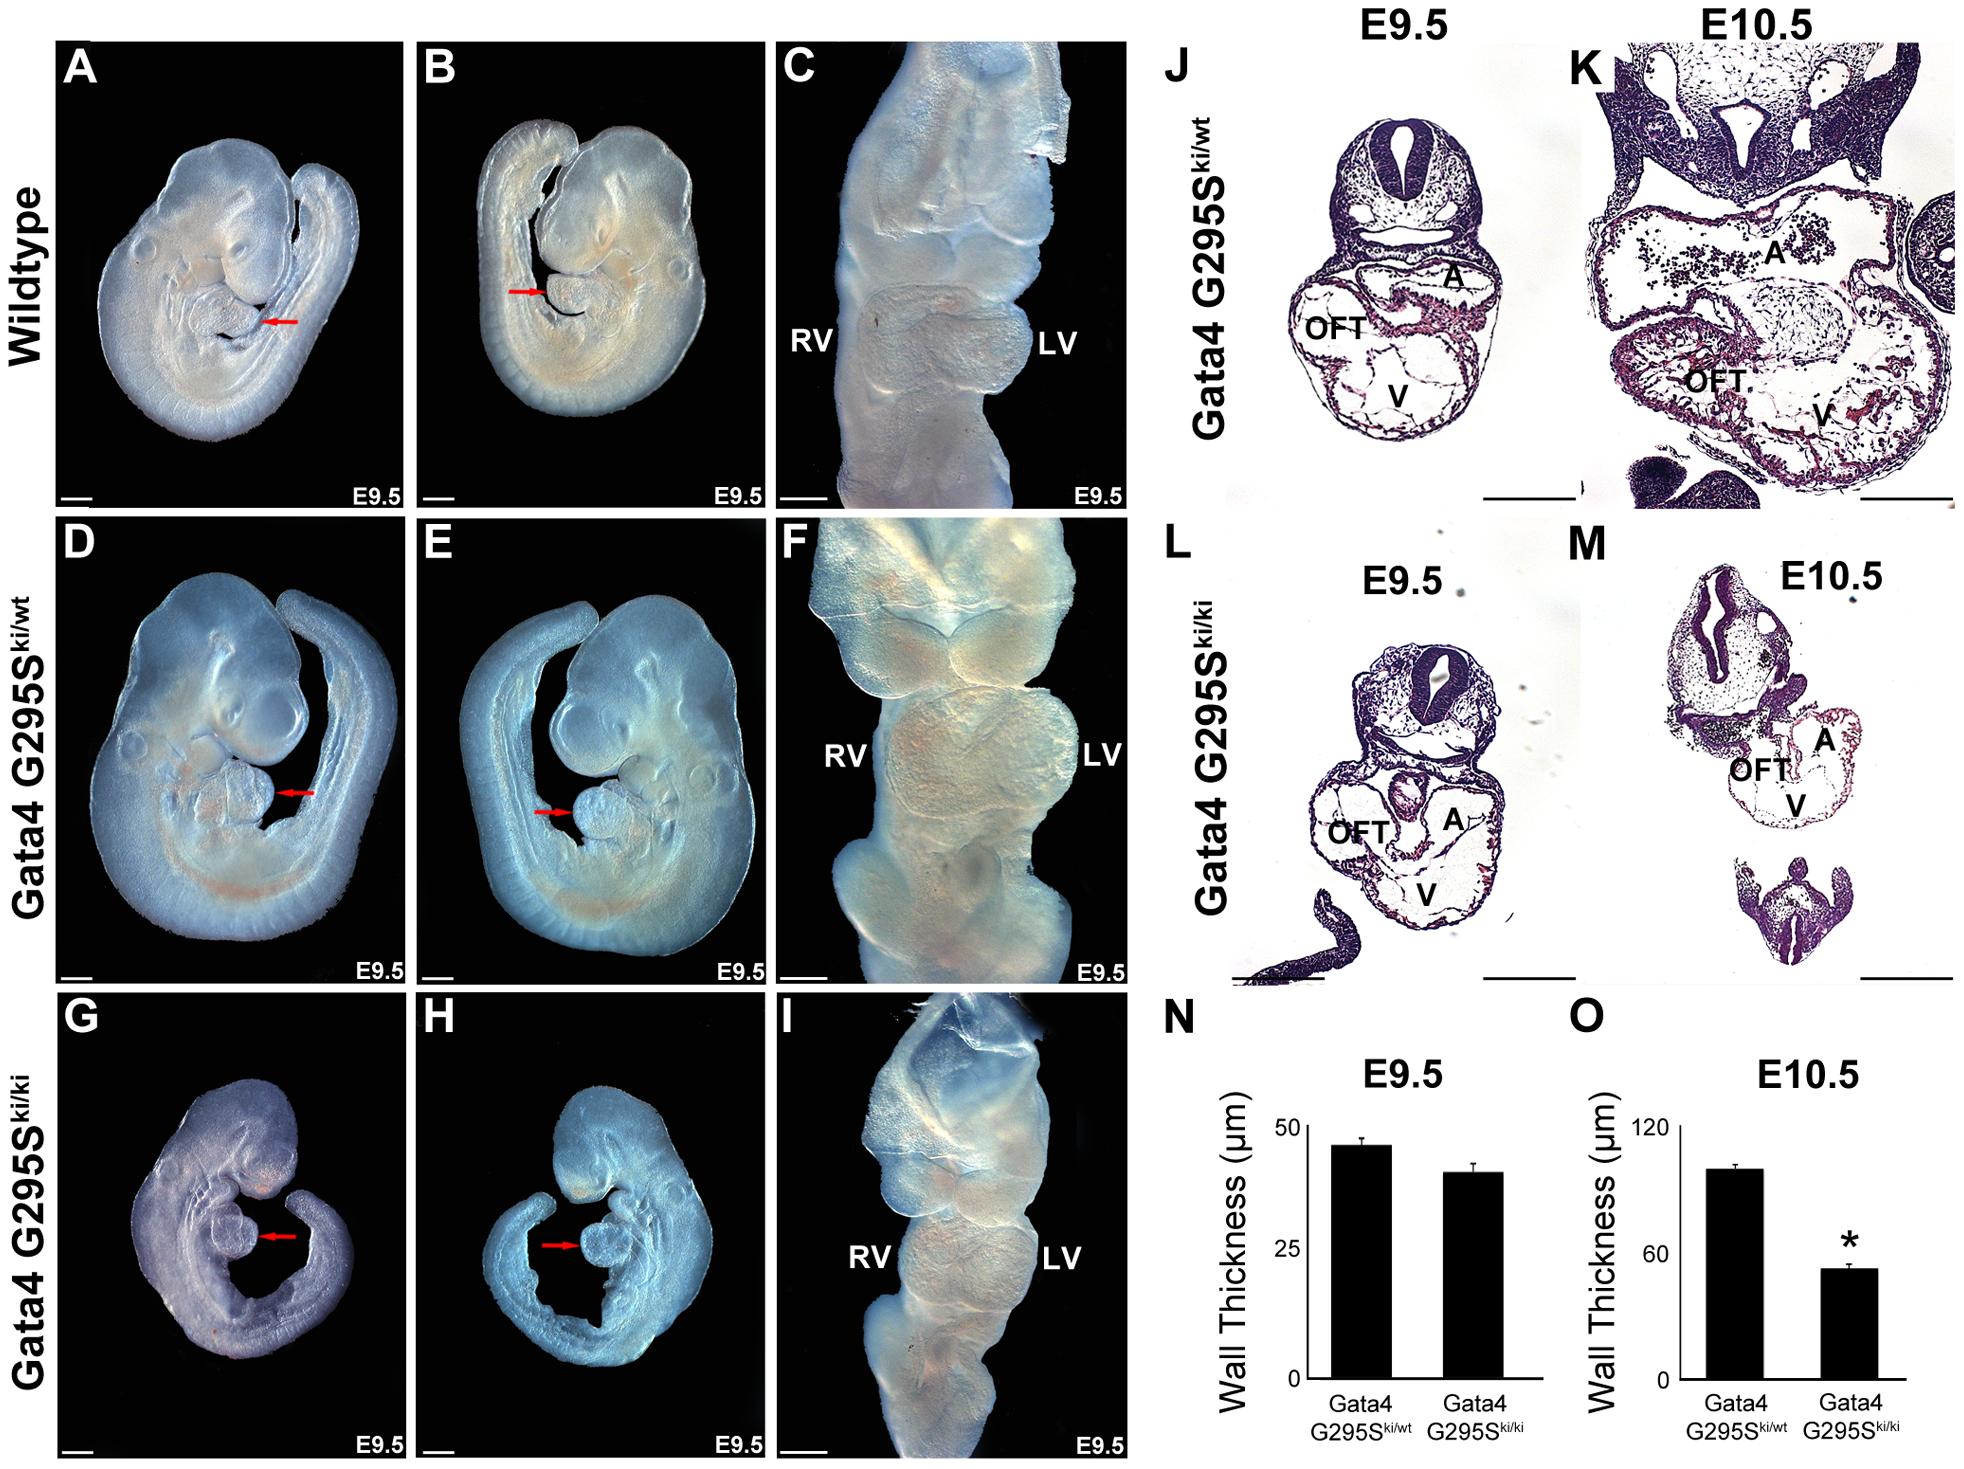 <i>Gata4 G295S<sup>ki/ki</sup></i> mice display growth retardation and a thin myocardium.